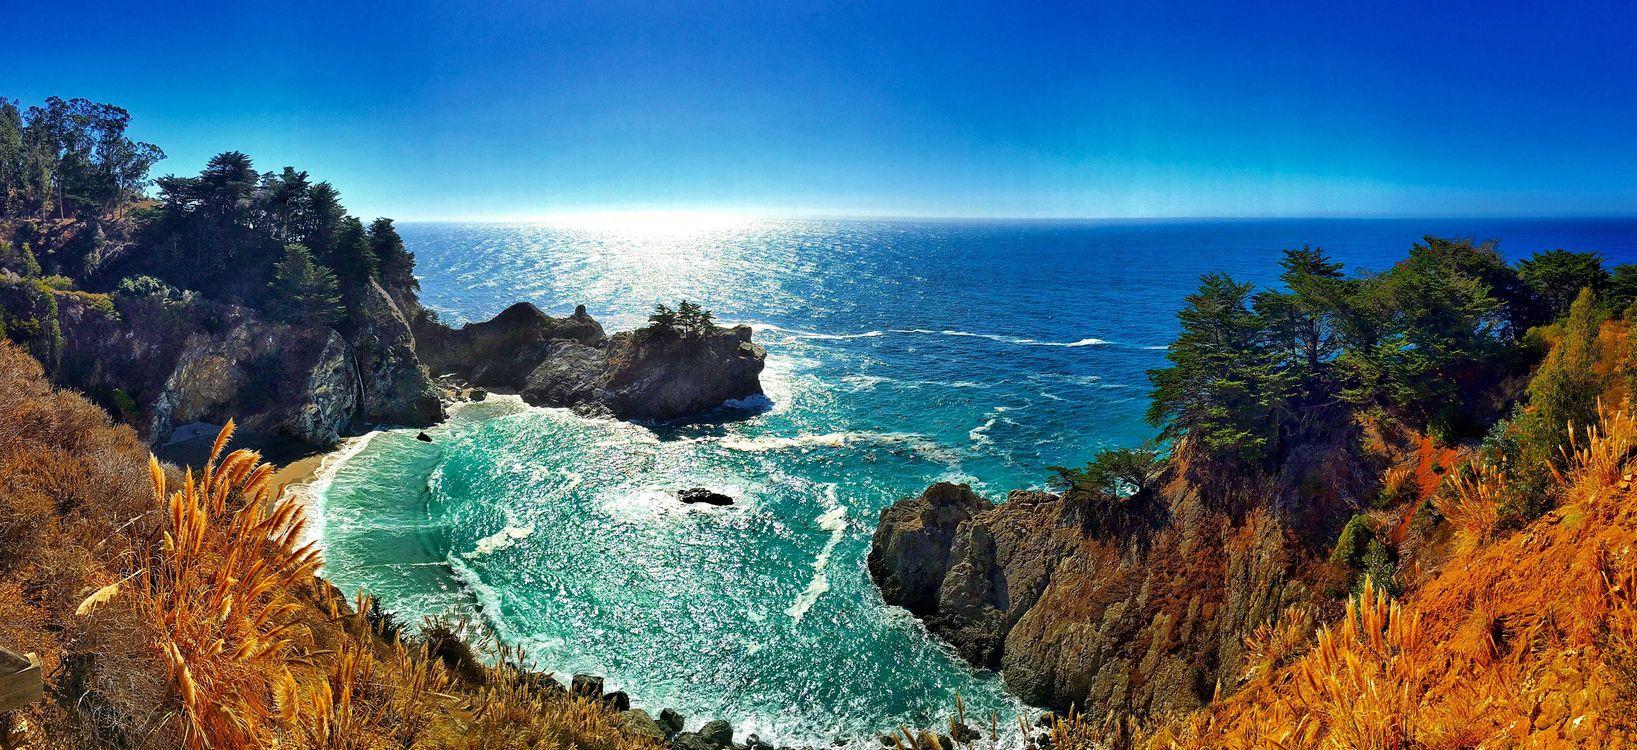 Фото бесплатно McWay Falls, Big Sur, California, Julia Pfeiffer Burns State Park, McWay Cove Beach, Биг-Сюр, Калифорния, Парк Джулии Пфайфер Берн, закат, водопад, море, берег, пляж, пейзаж, панорама, пейзажи